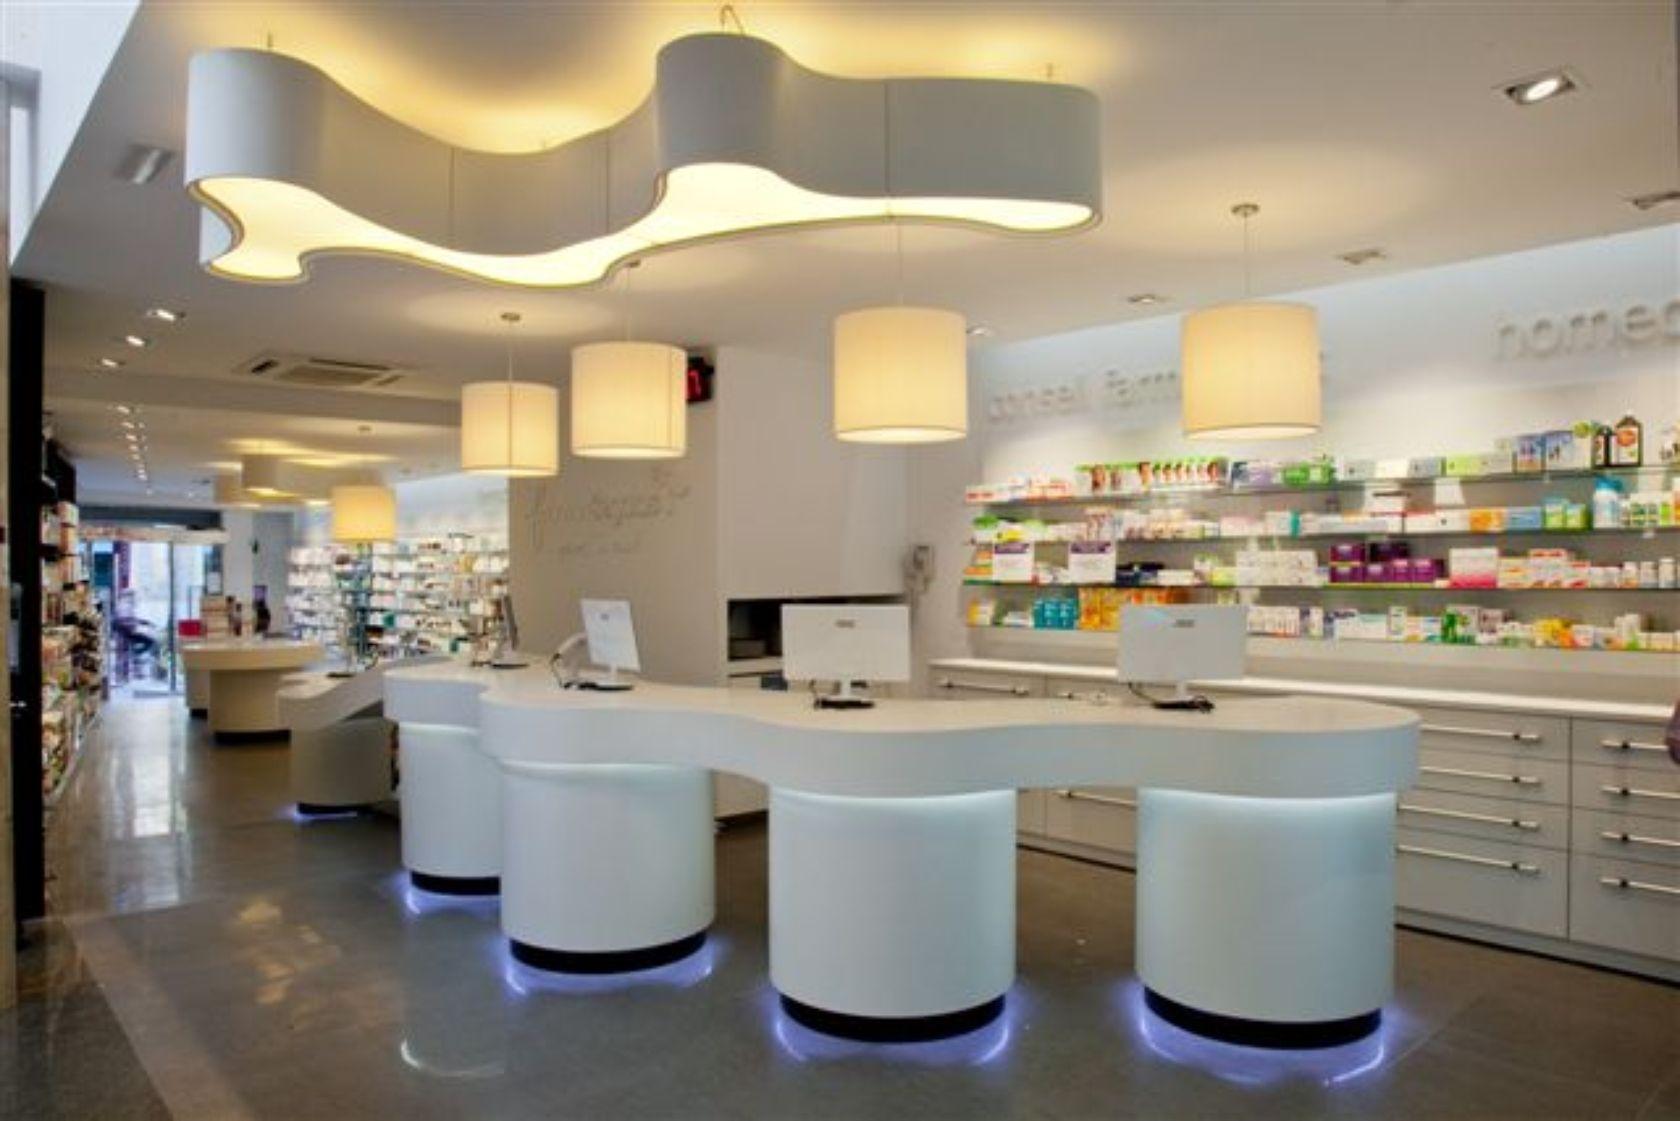 Pharmacy Segalas. Retail Design Sabadell. Barcelona (Spain)  QIDStudio. Artur Fuster Architects